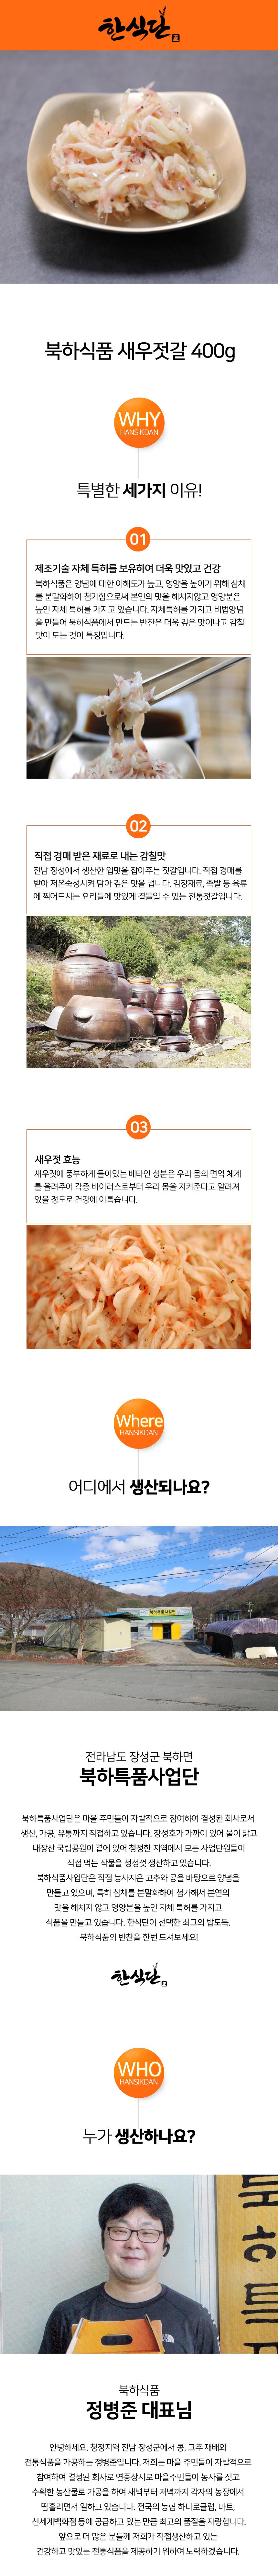 51_page_01_d.jpg